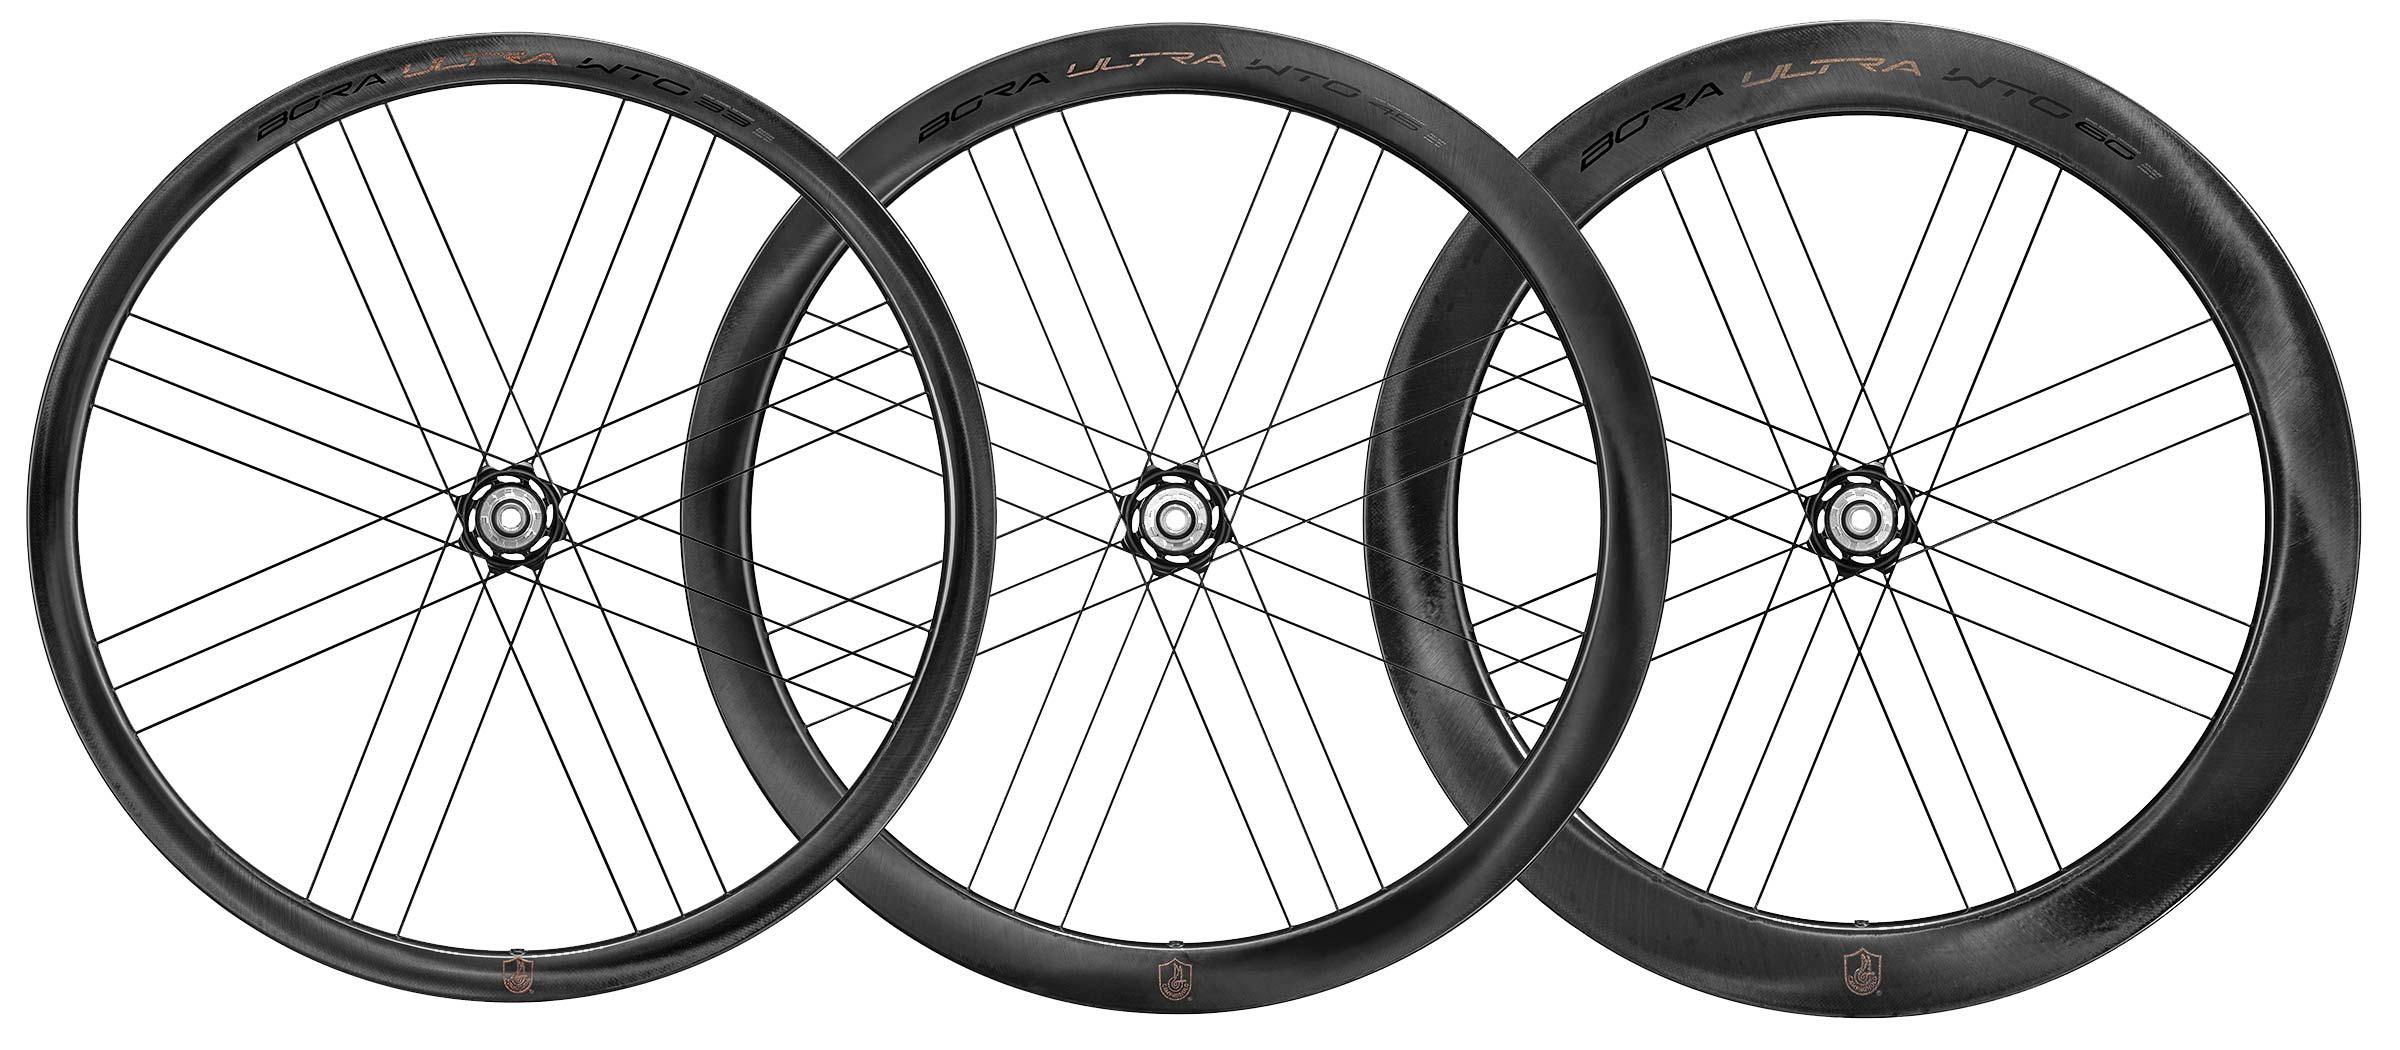 2021 Campagnolo Bora Ultra WTO aero carbon road bike wheelset